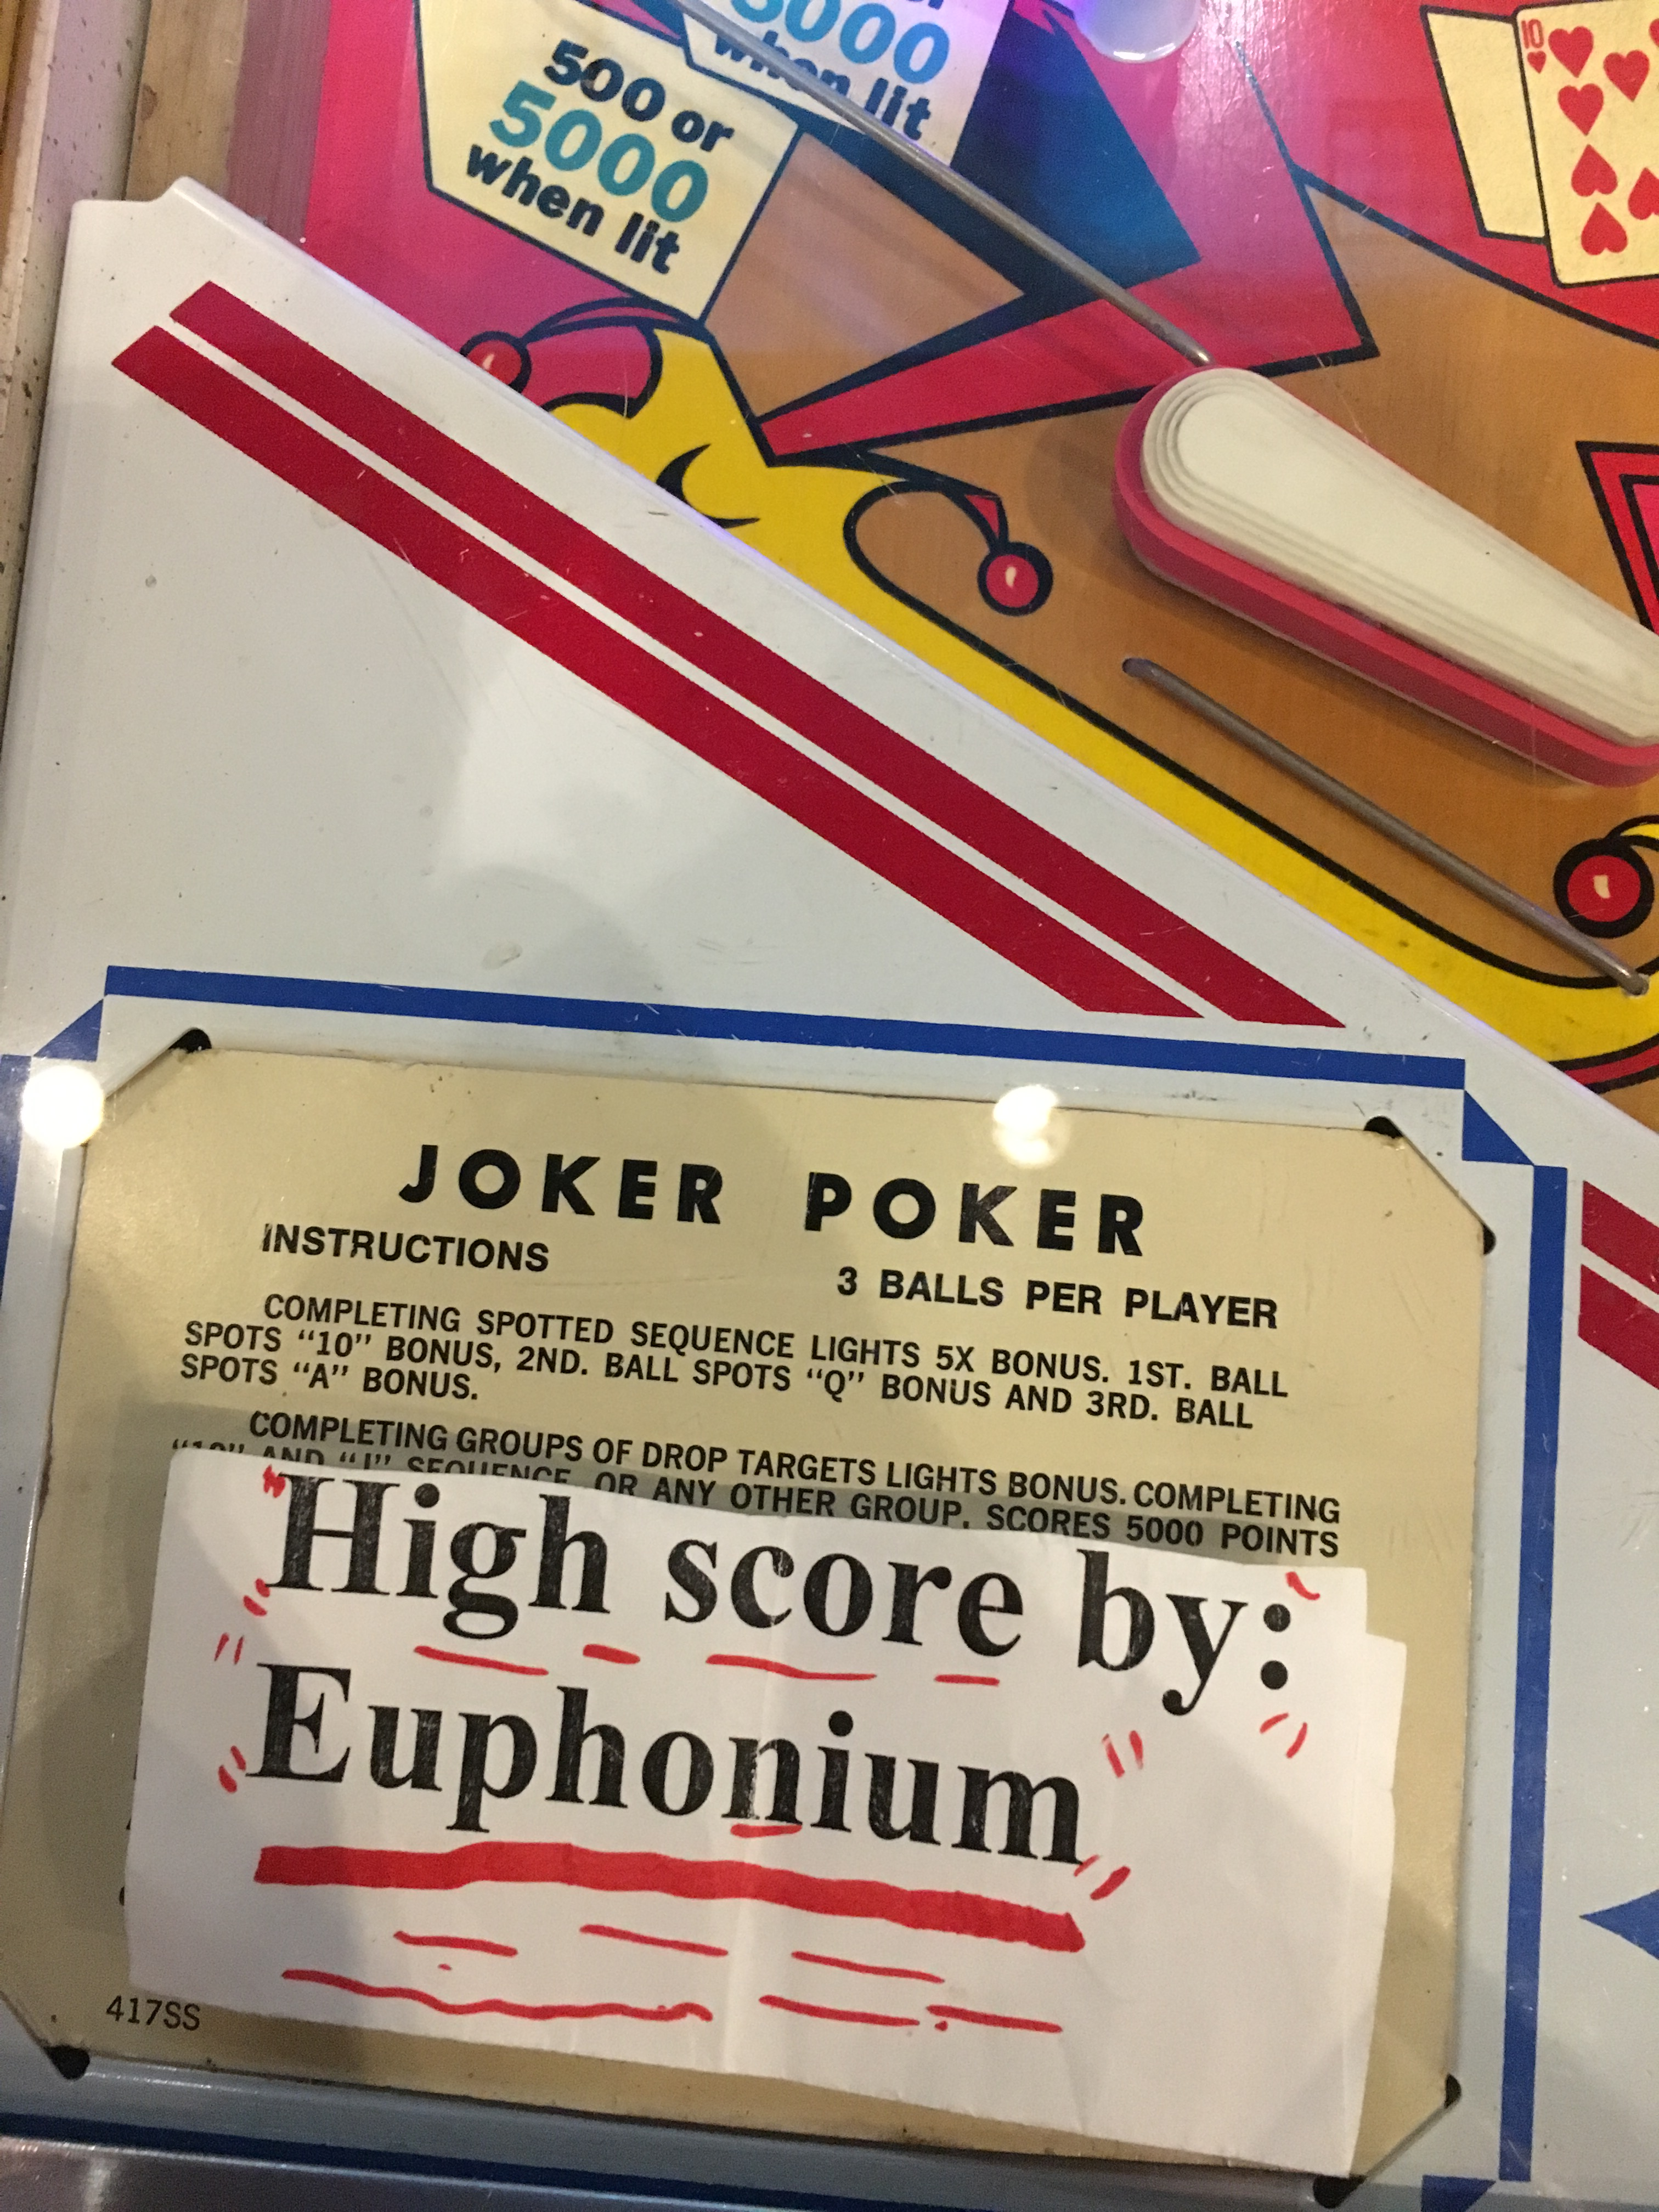 euphonium: Joker Poker [Gottlieb EM] (Pinball: 3 Balls) 178,050 points on 2018-03-18 21:13:48